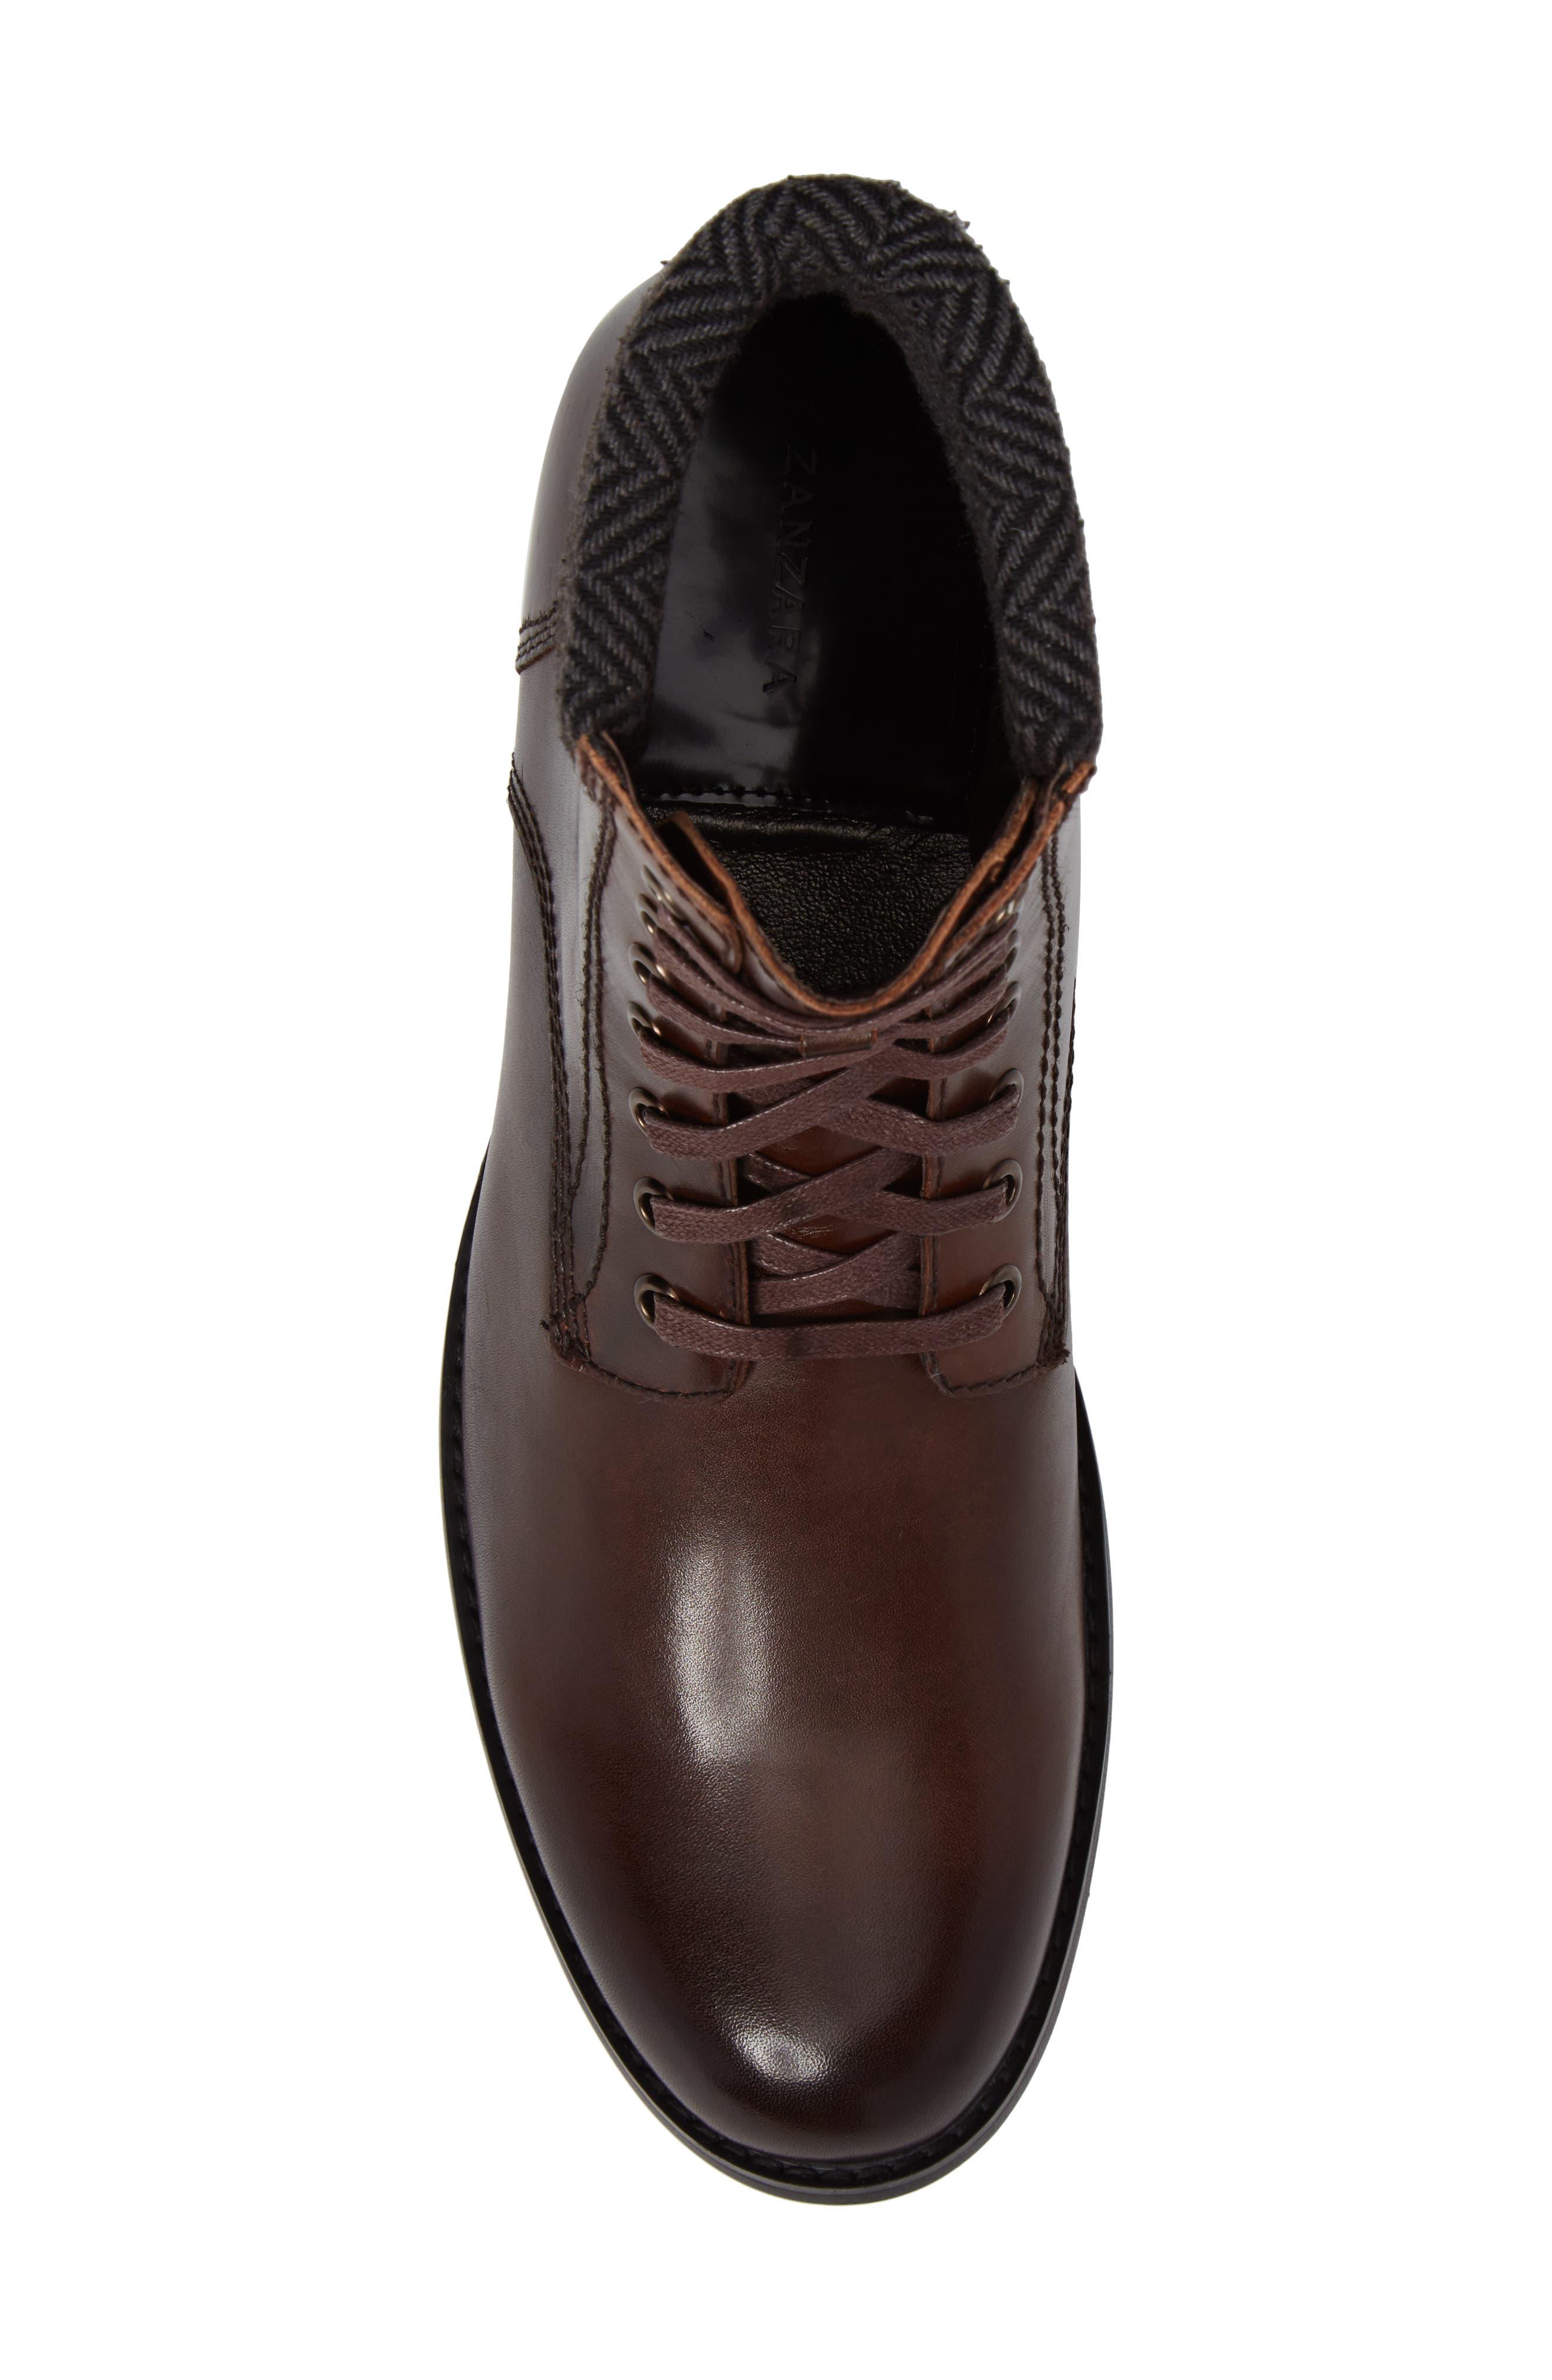 Saar Plain Toe Boot,                             Alternate thumbnail 5, color,                             Brown Leather